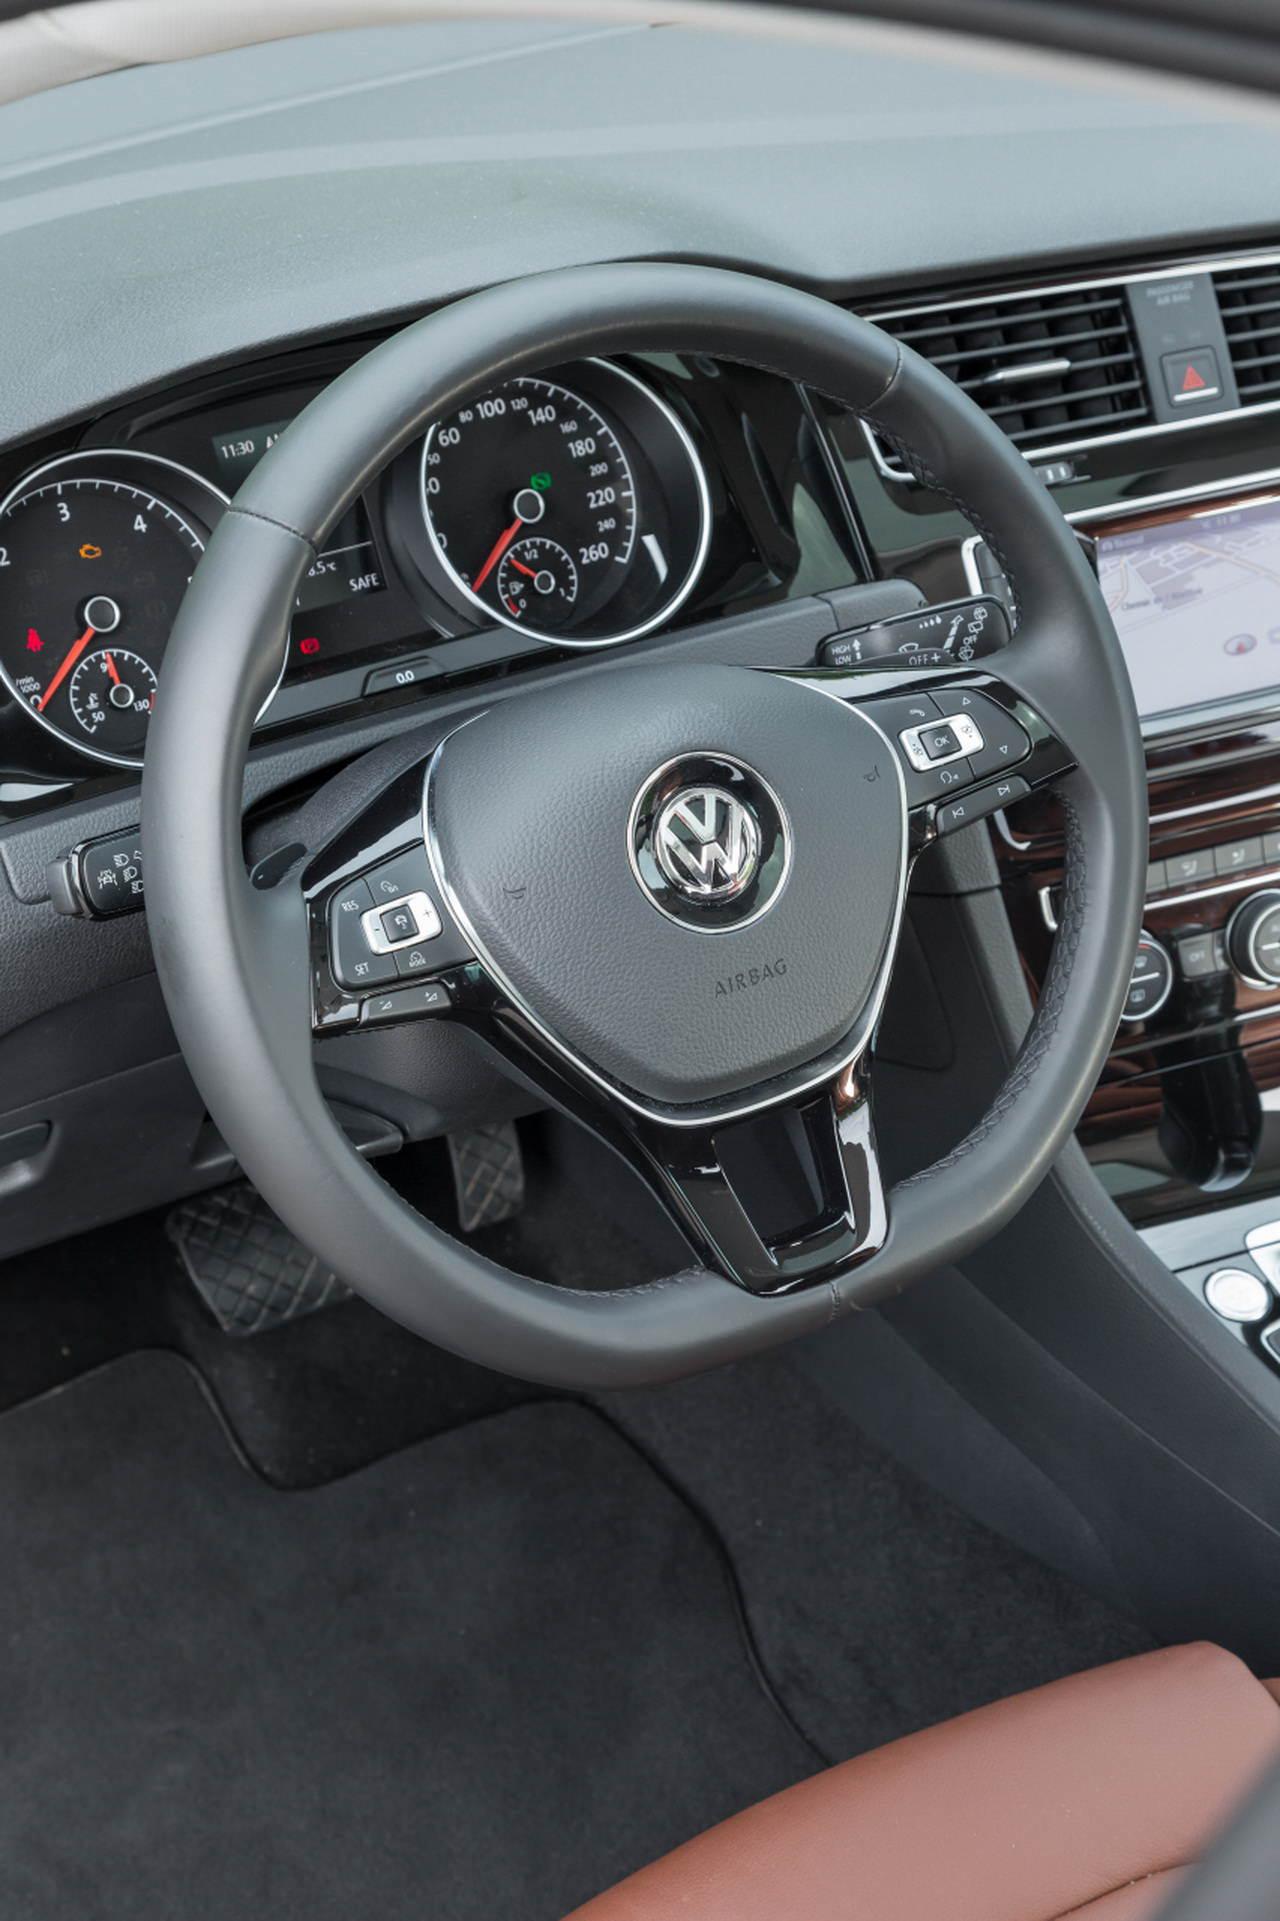 nouvelle peugeot 308 vs volkswagen golf vii le match diesel 150 ch photo 67 l 39 argus. Black Bedroom Furniture Sets. Home Design Ideas